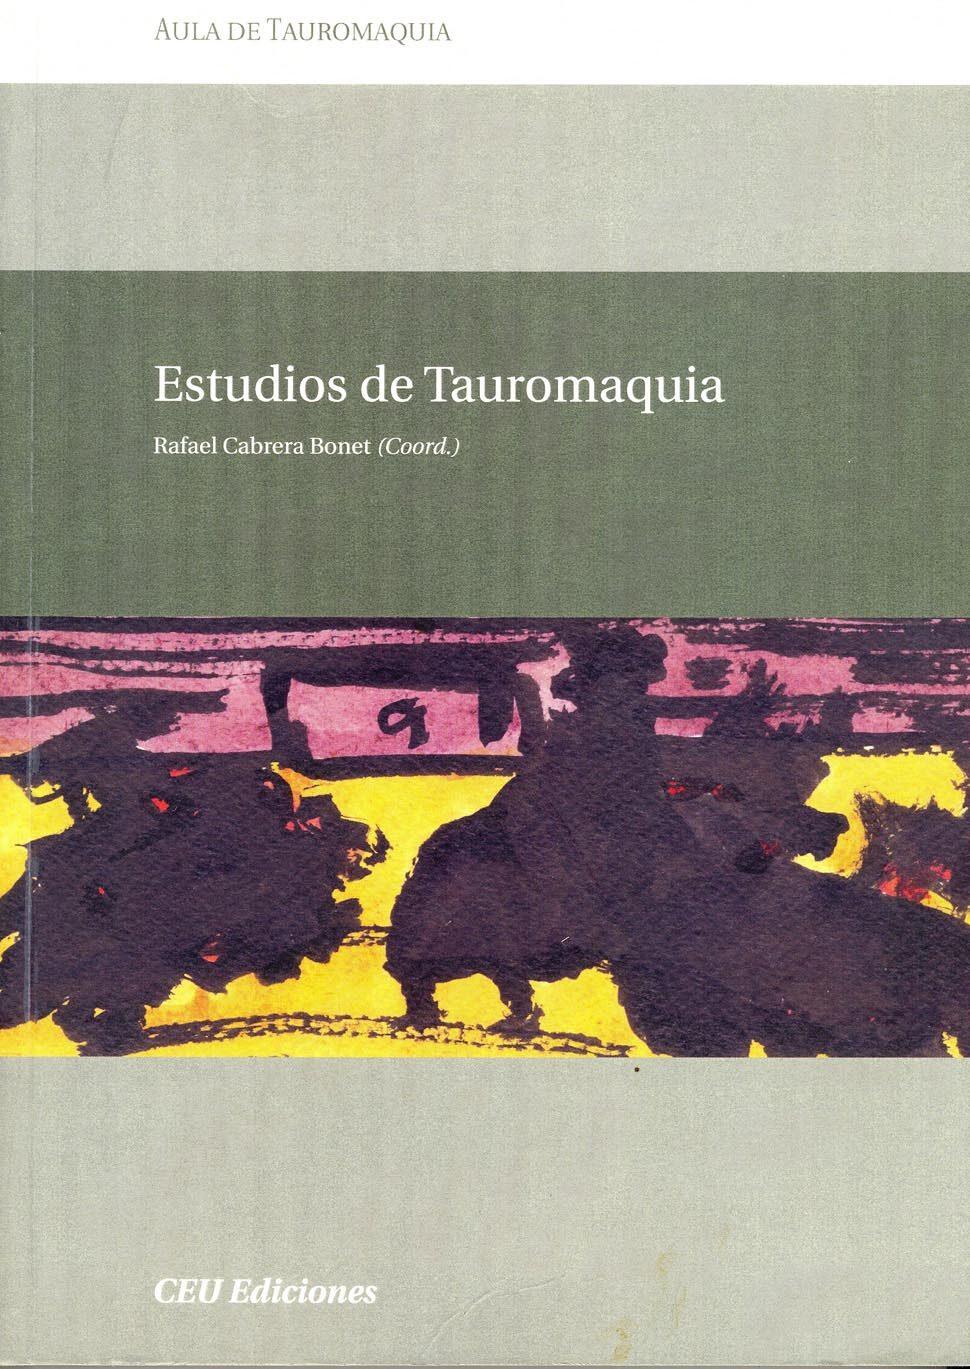 Aula De Tauromaquia Iv: Curso Academico 2004-2005. Estudios De Ta Uromaquia por Rafael Cabrera Bonet epub